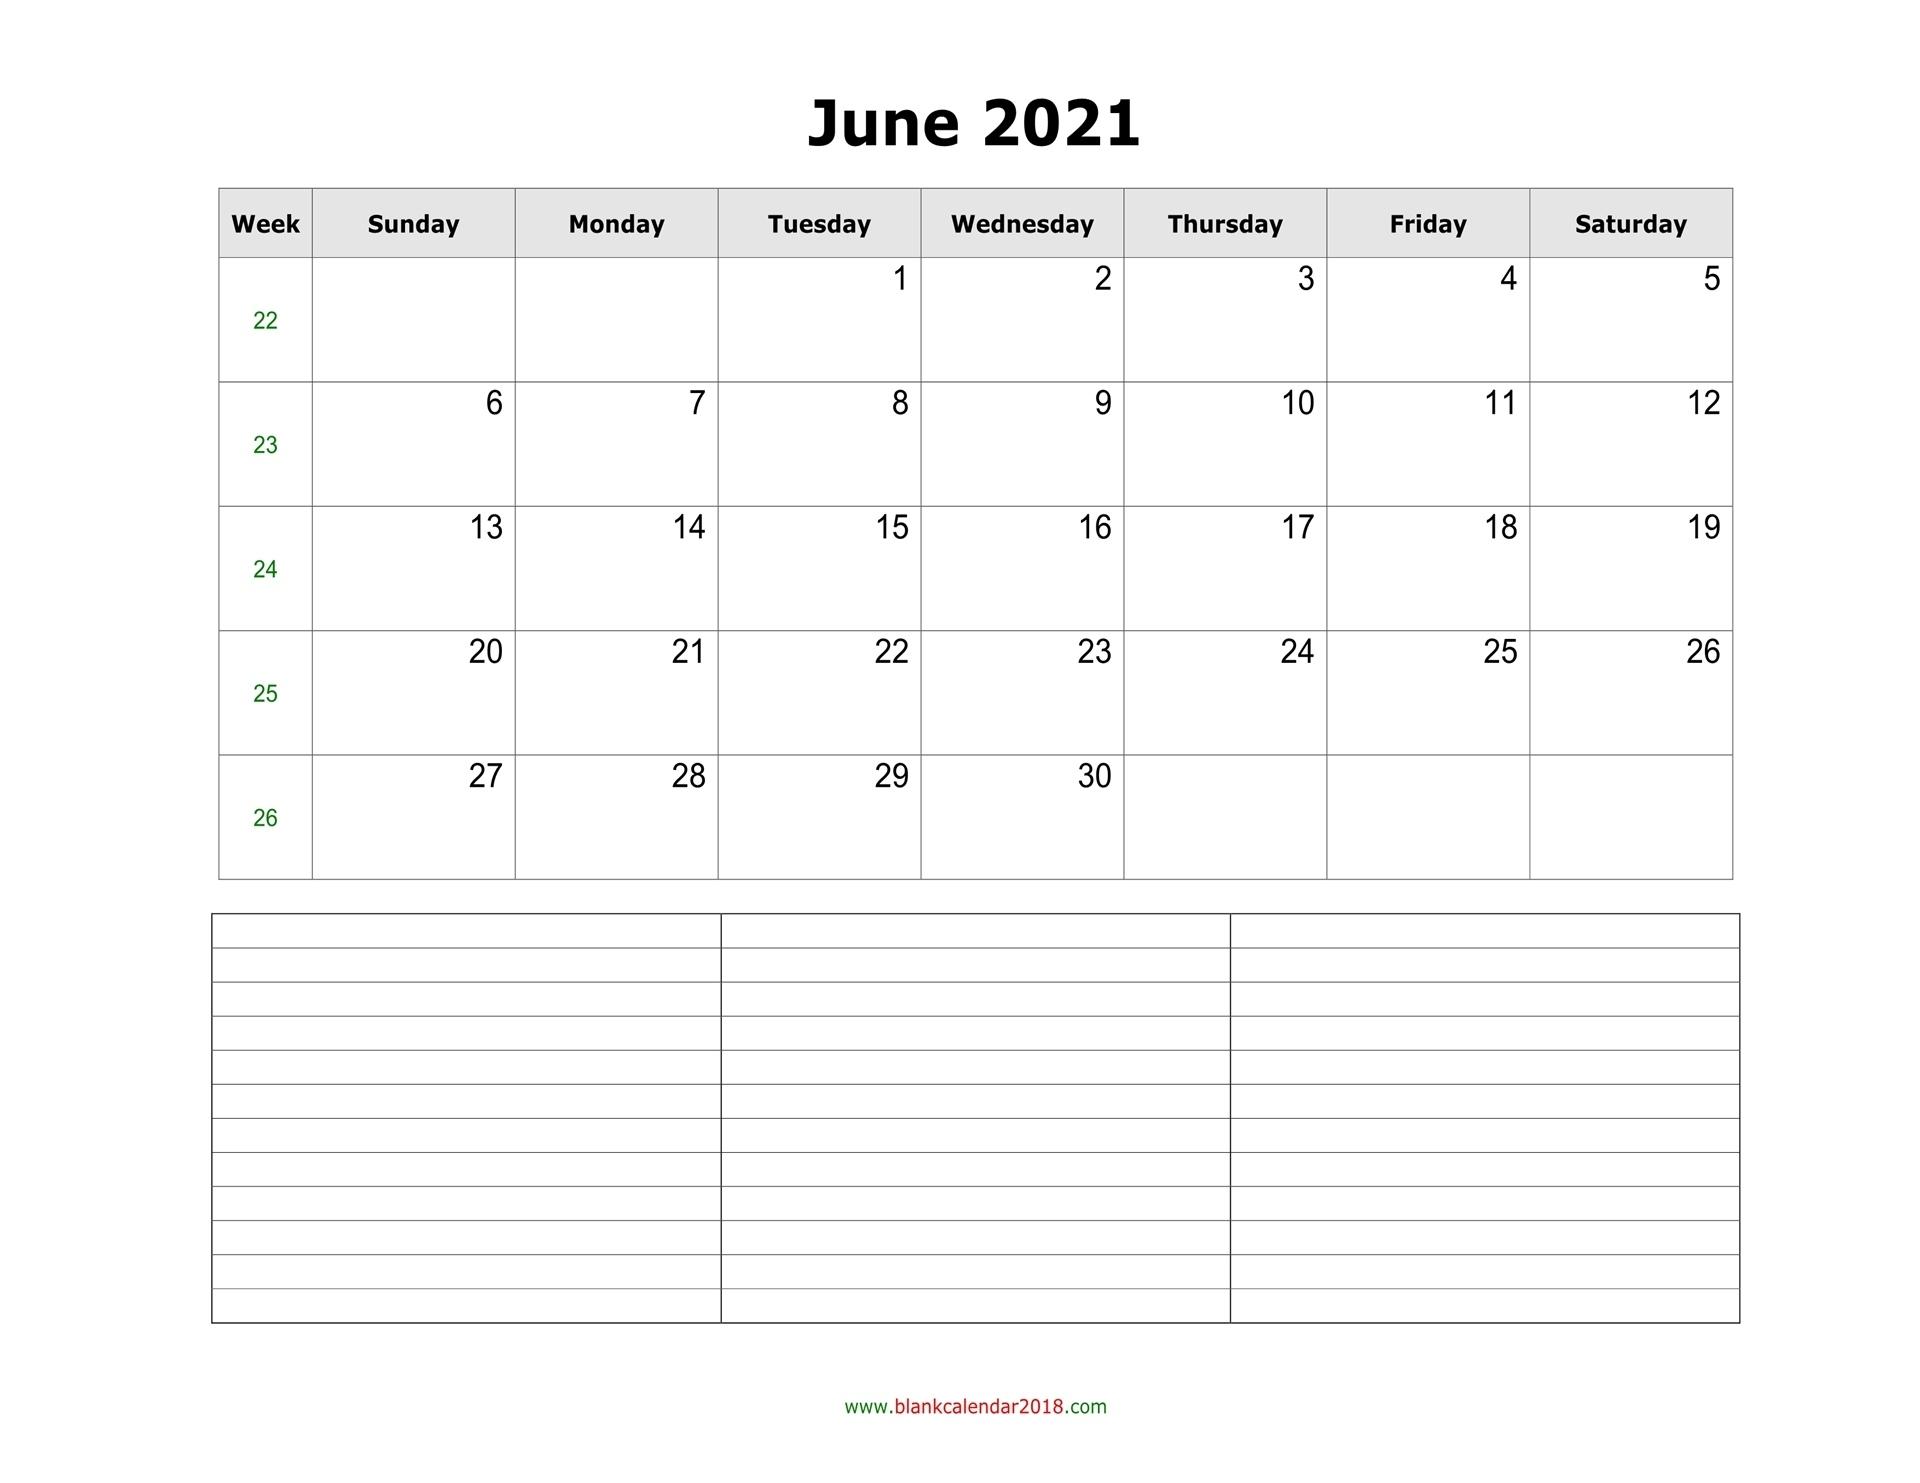 Blank Calendar For June 2021 Editable June 2021 Calendar